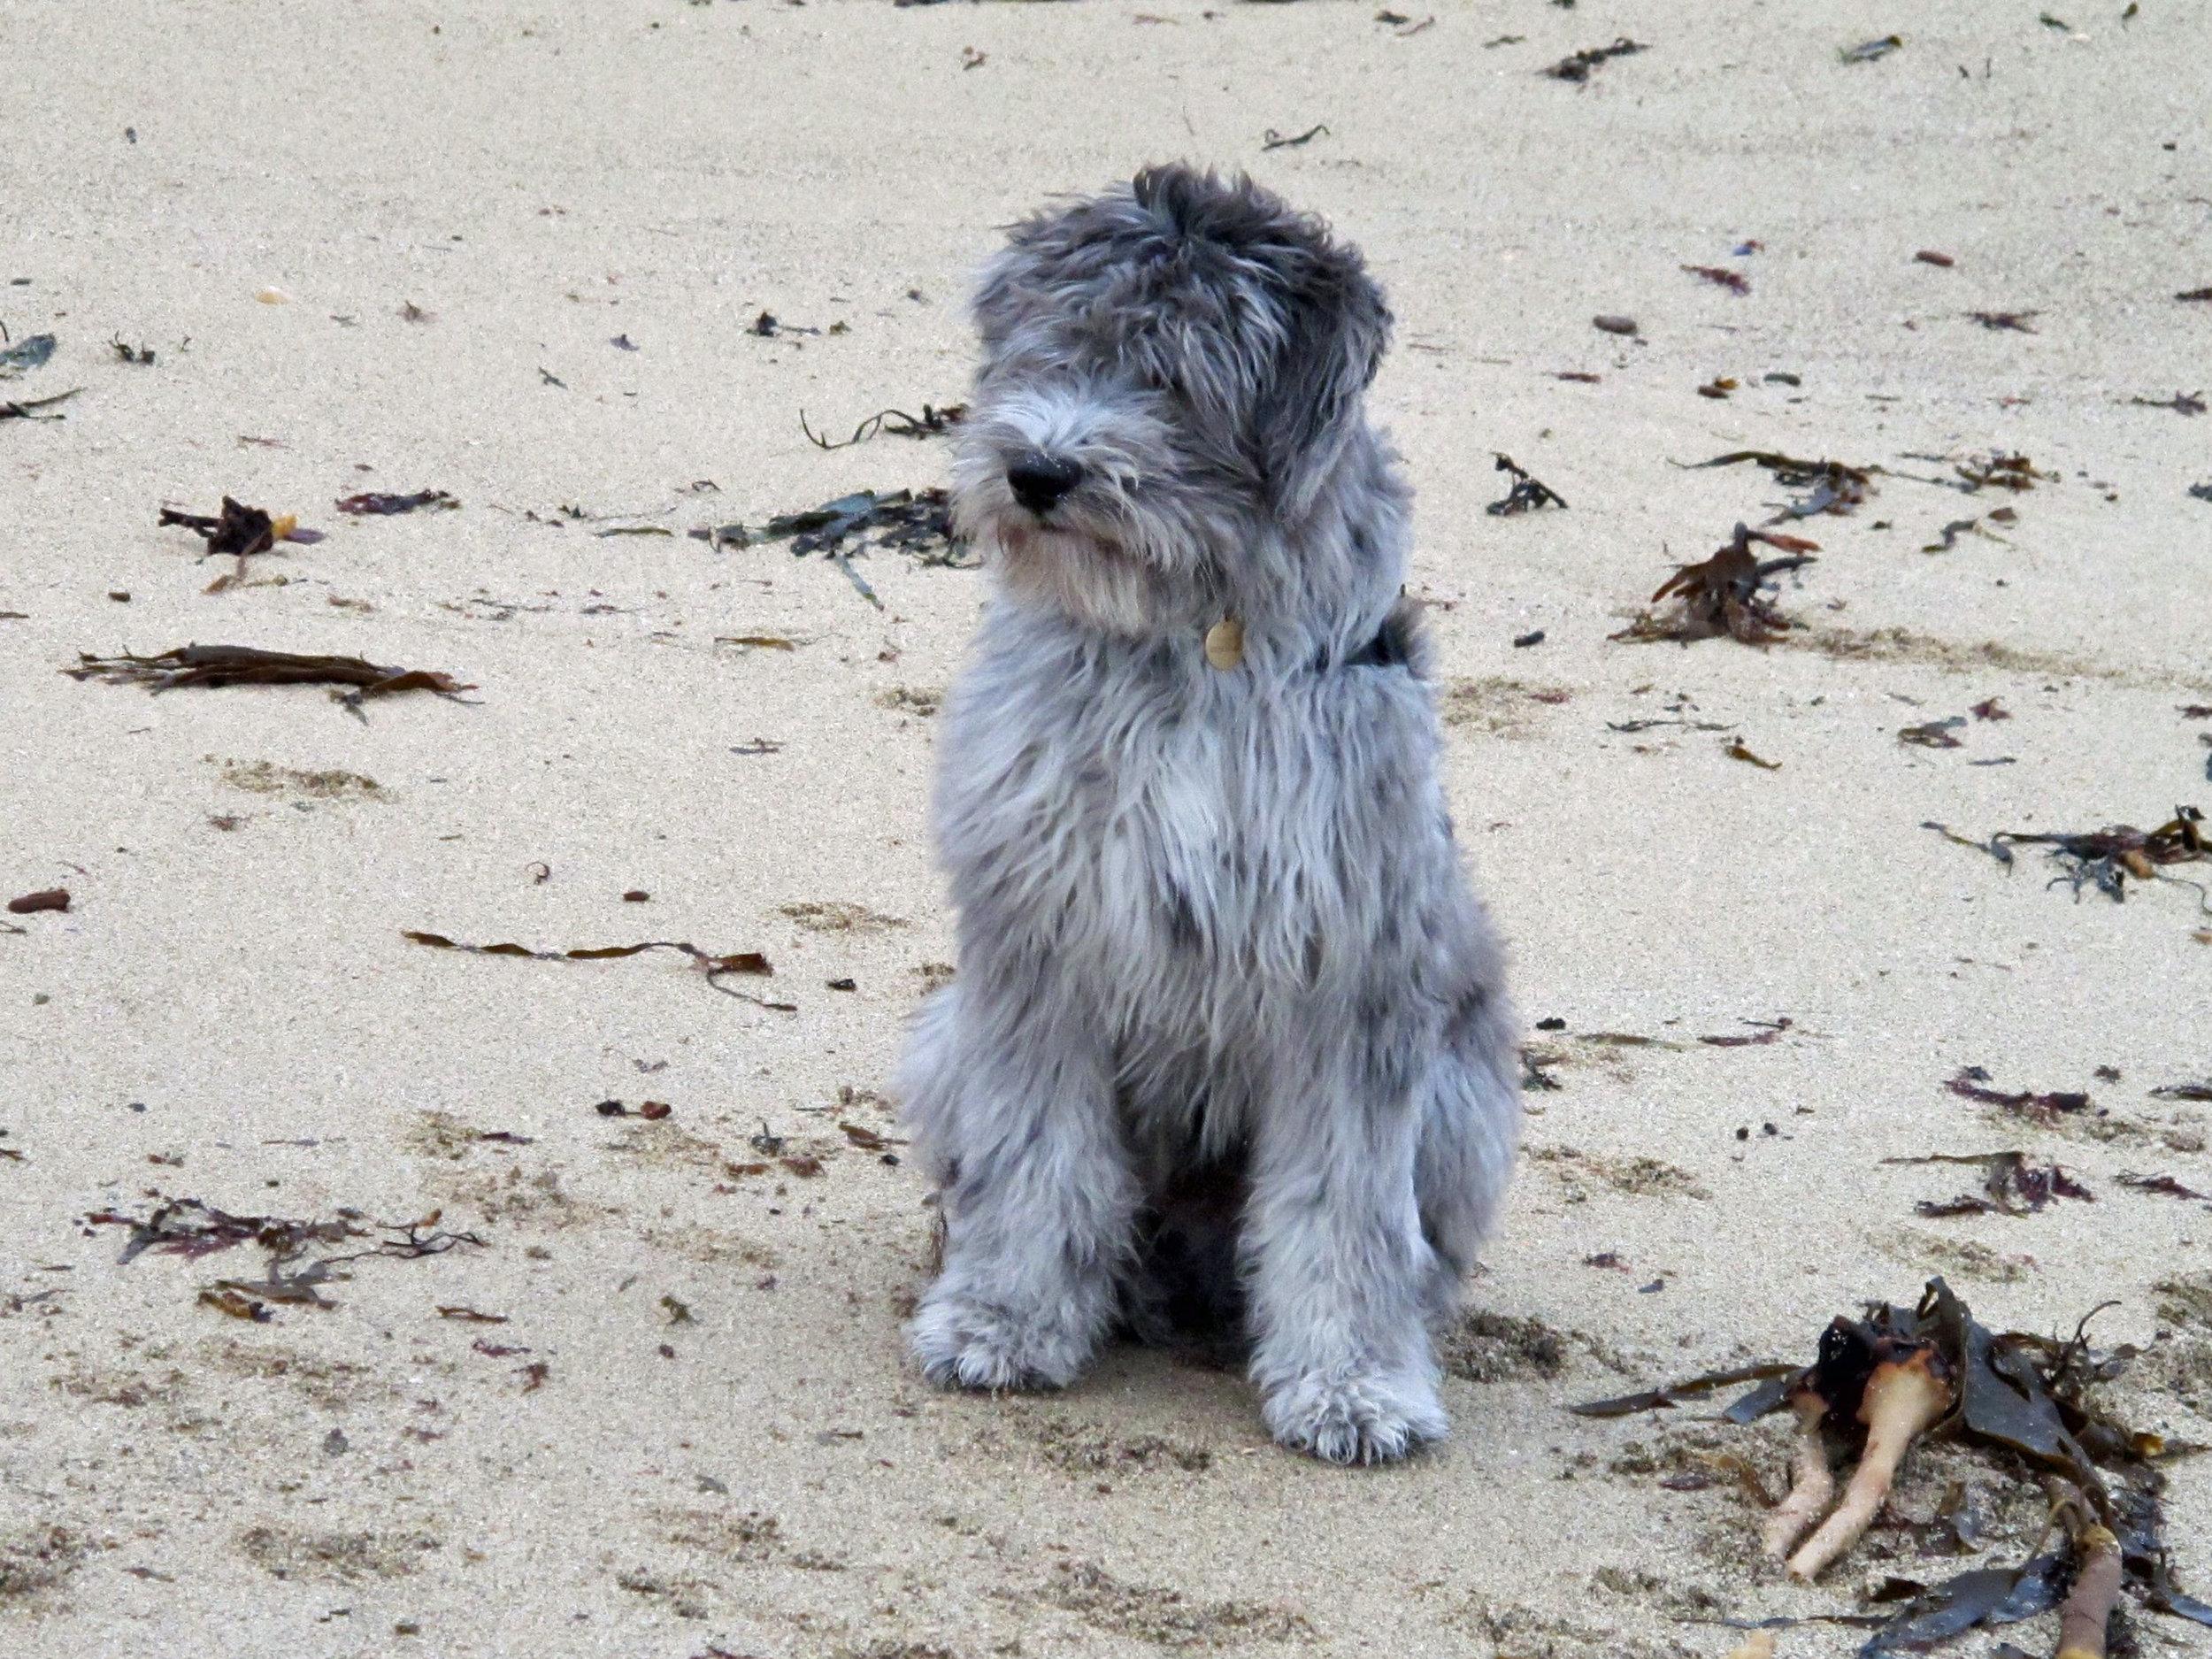 Ragnar puppy of Cicci and Mauro Kopie.jpg